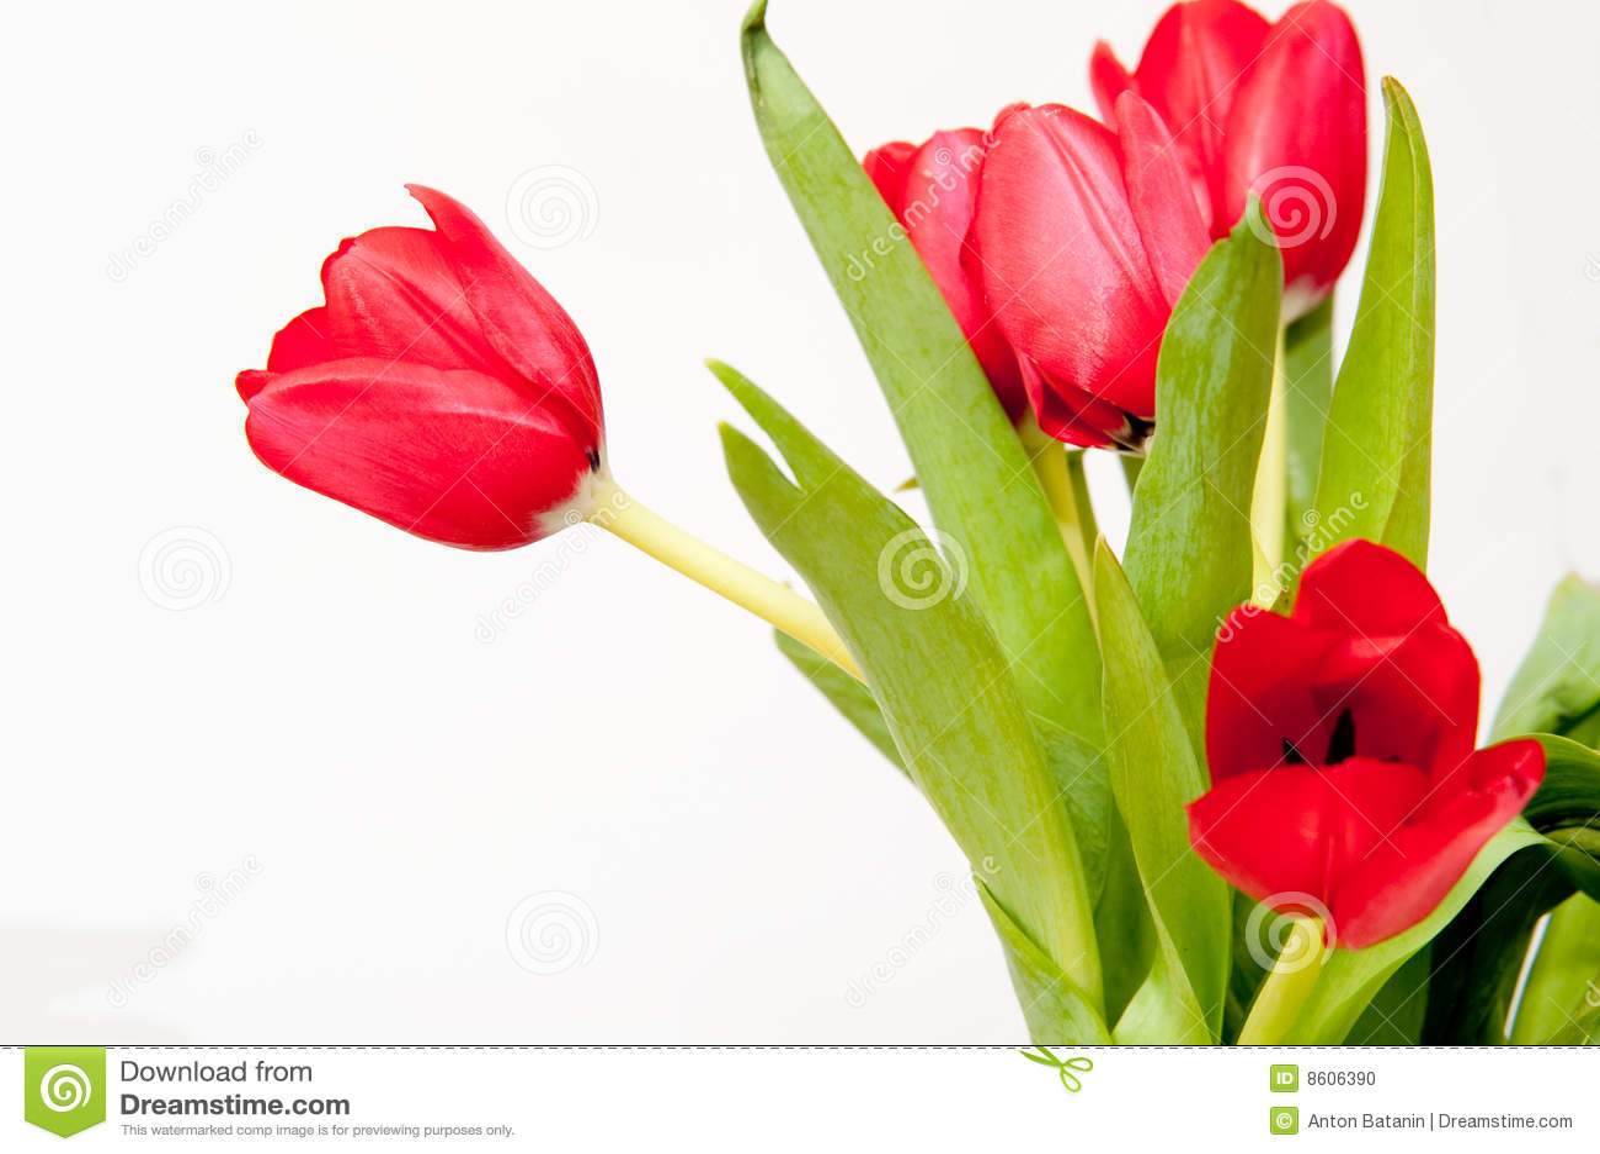 Bouqet de tulipanes rojos